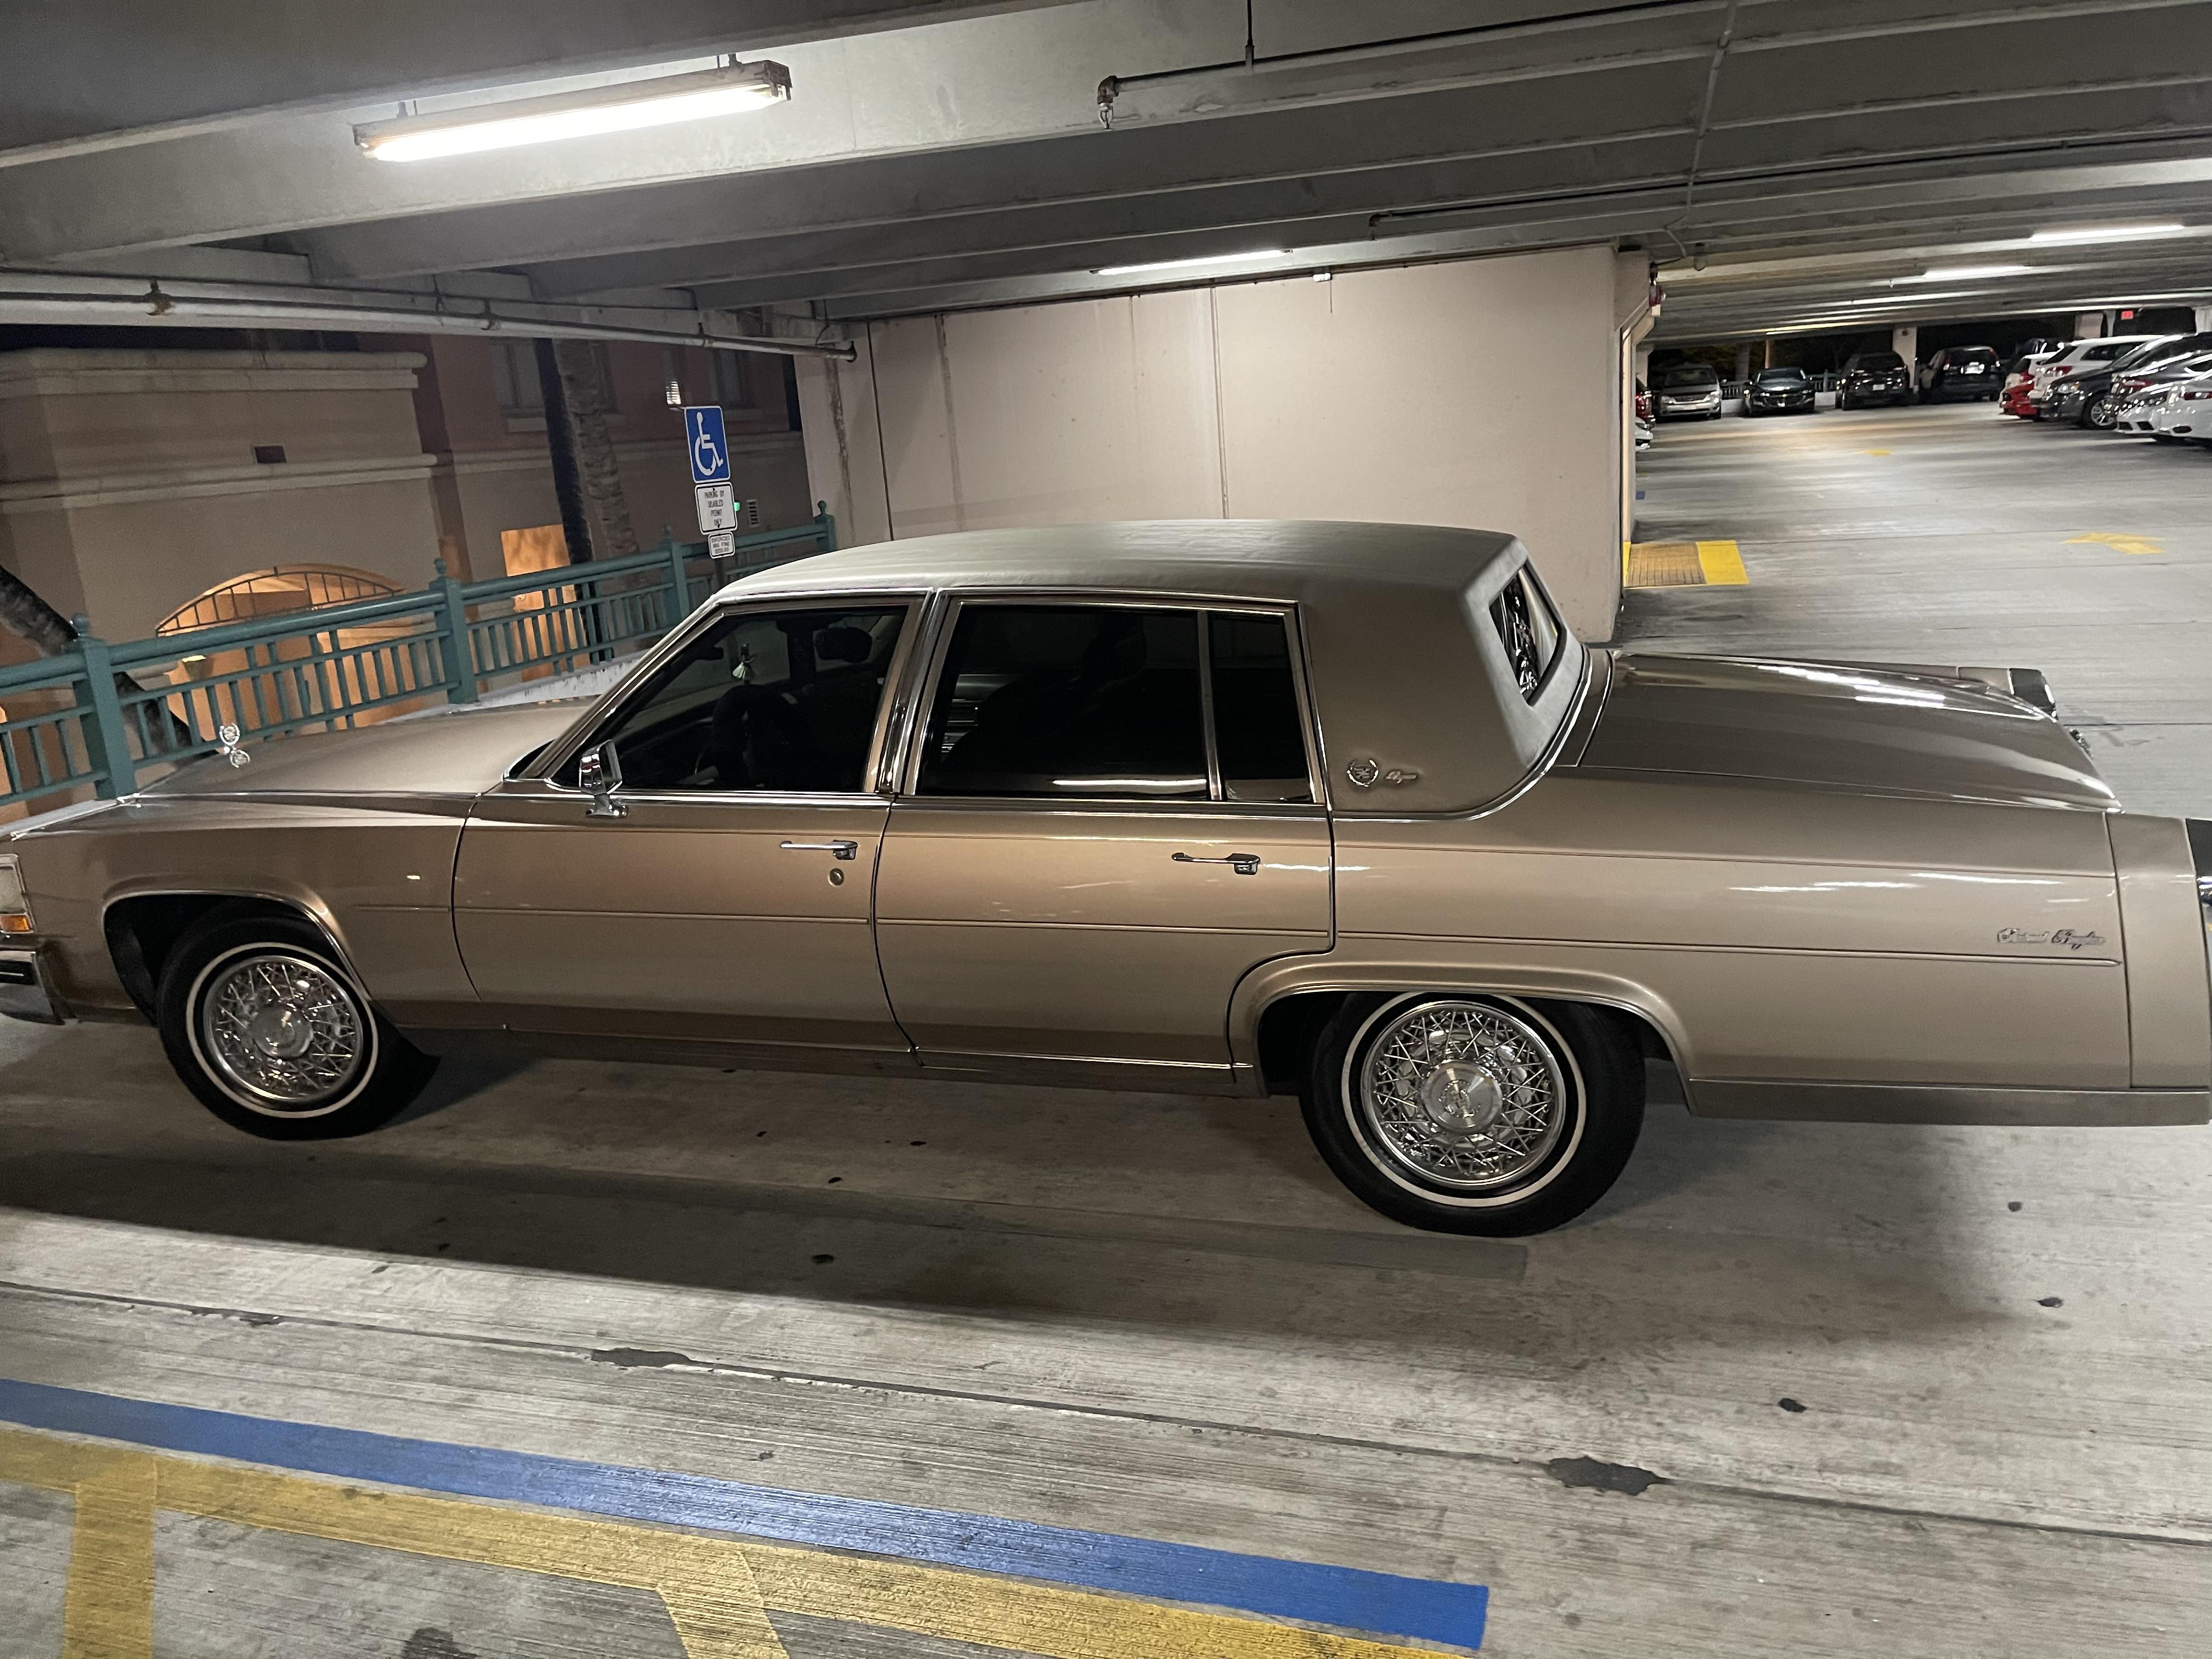 Cadillac Fleetwood Brogham D'Elegance Hire Boynton Beach